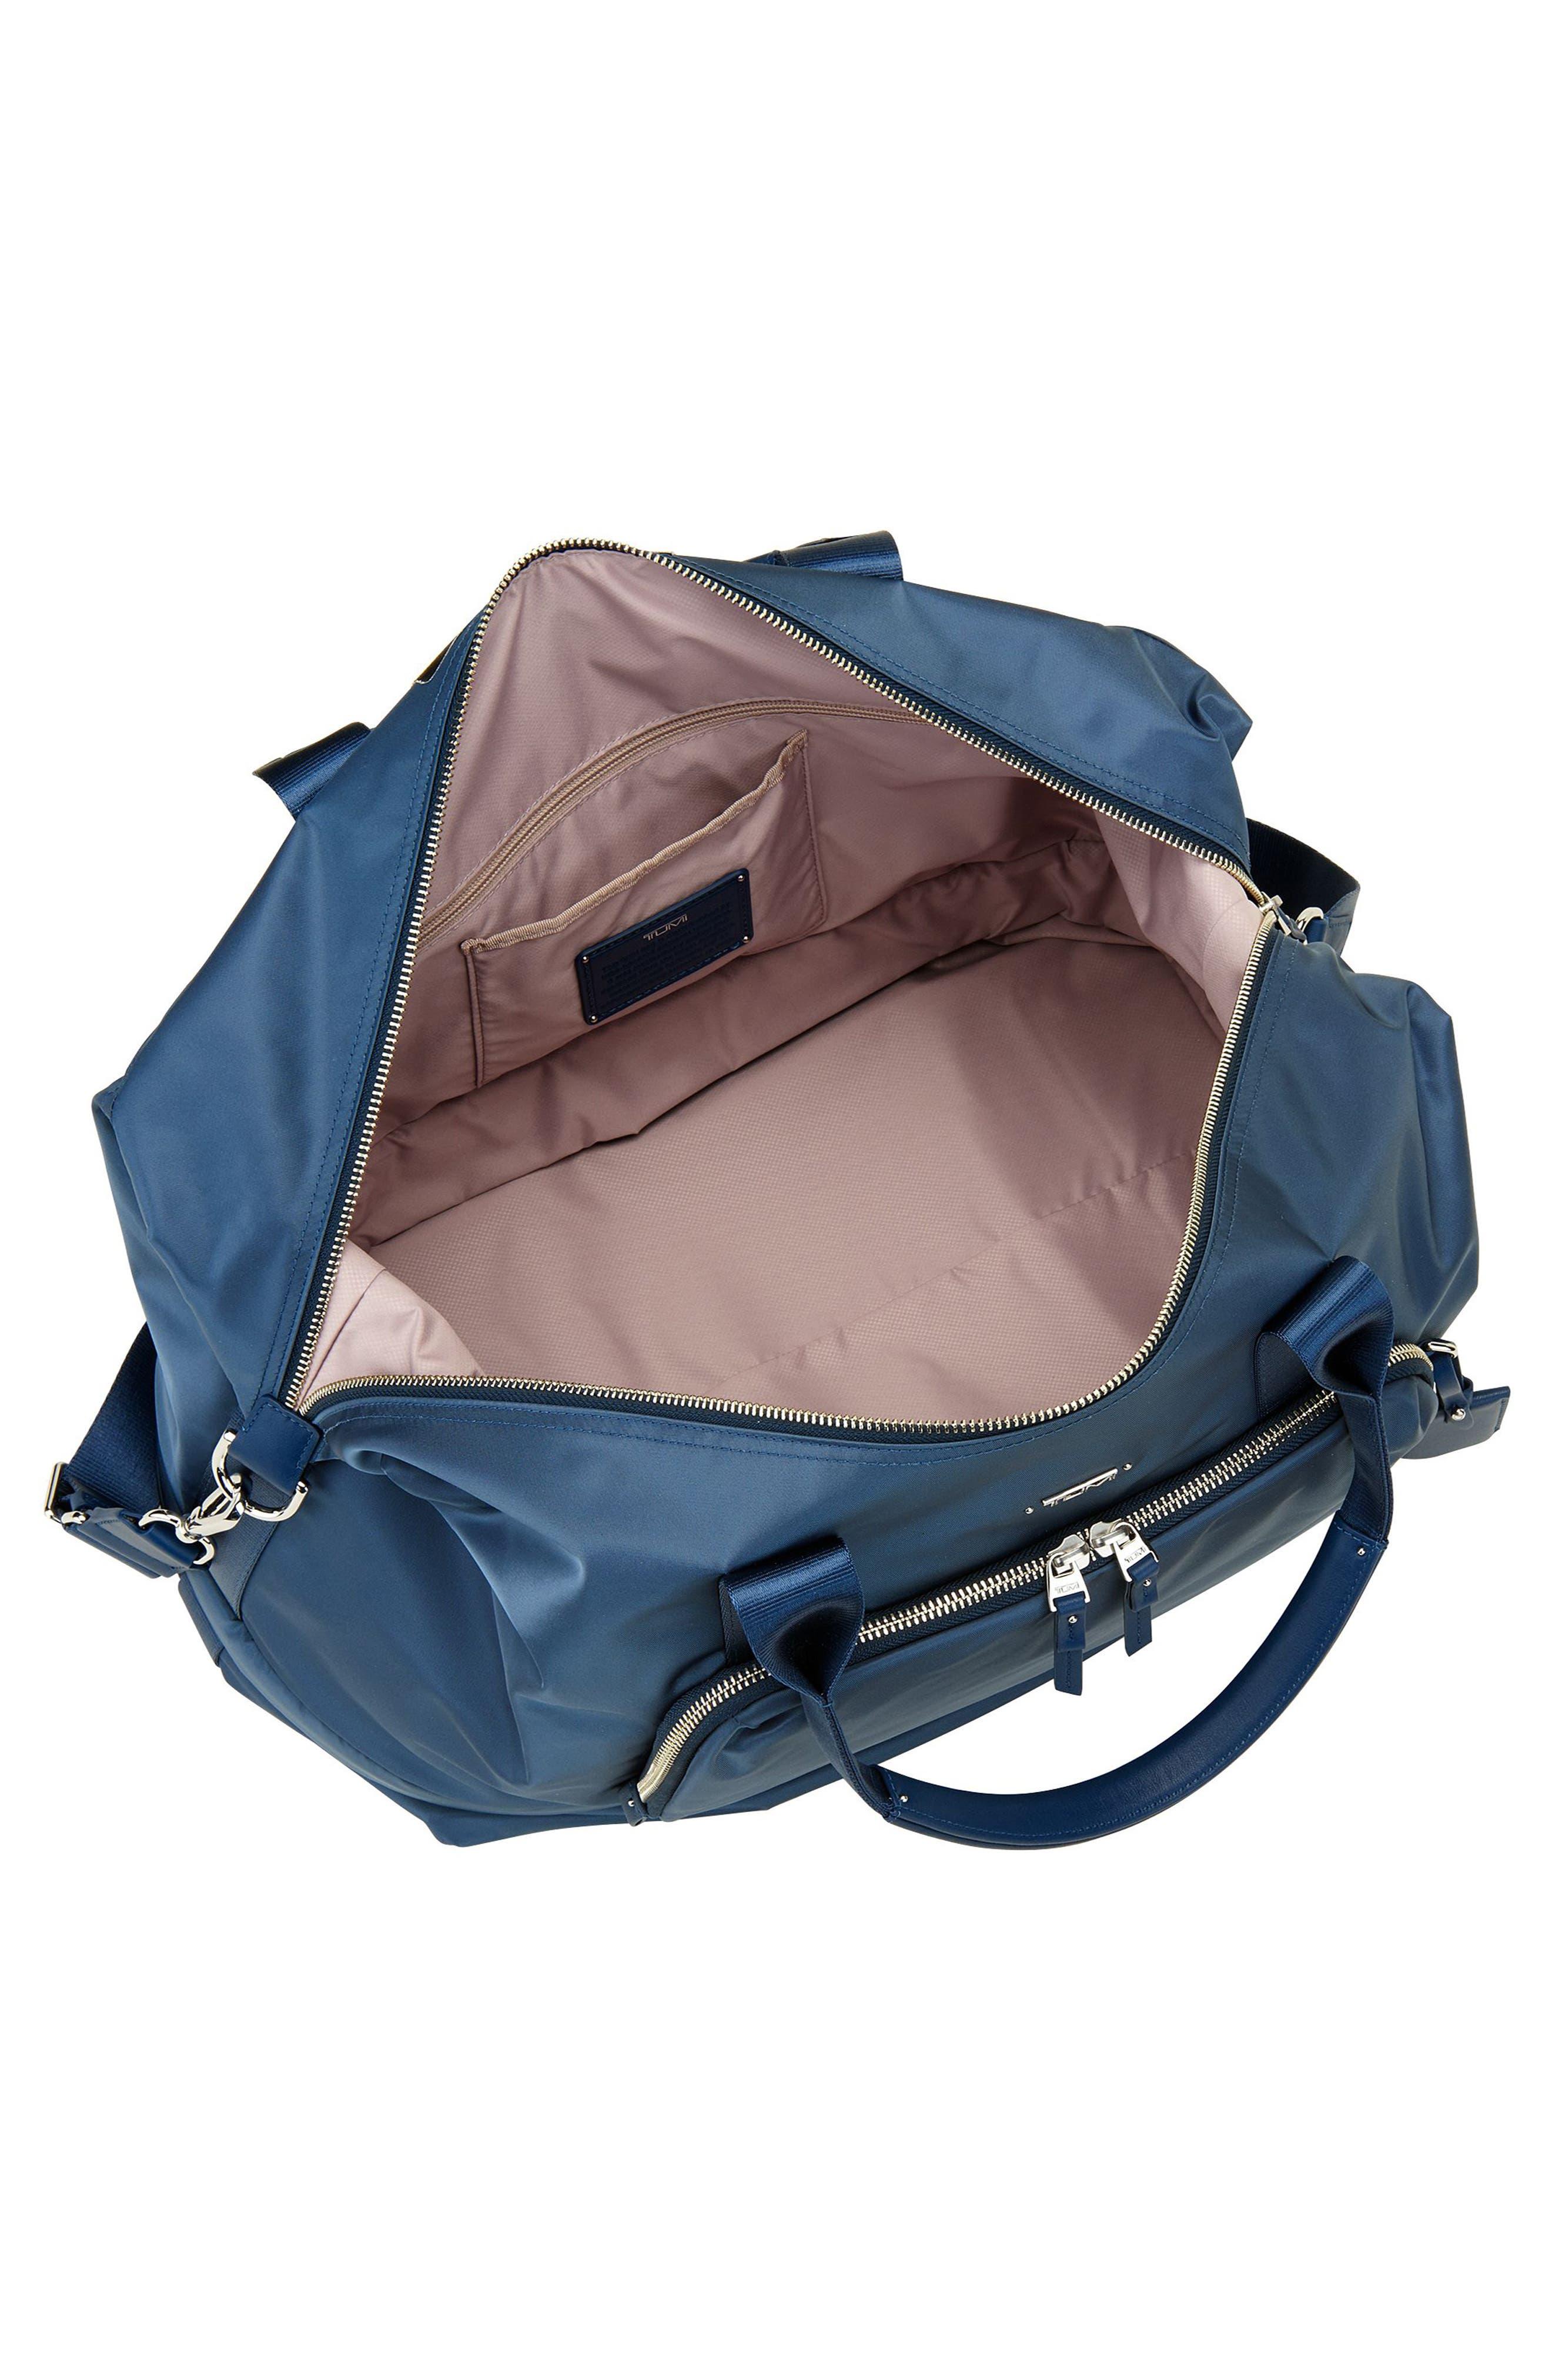 Durban Expandable Duffel Bag,                             Alternate thumbnail 4, color,